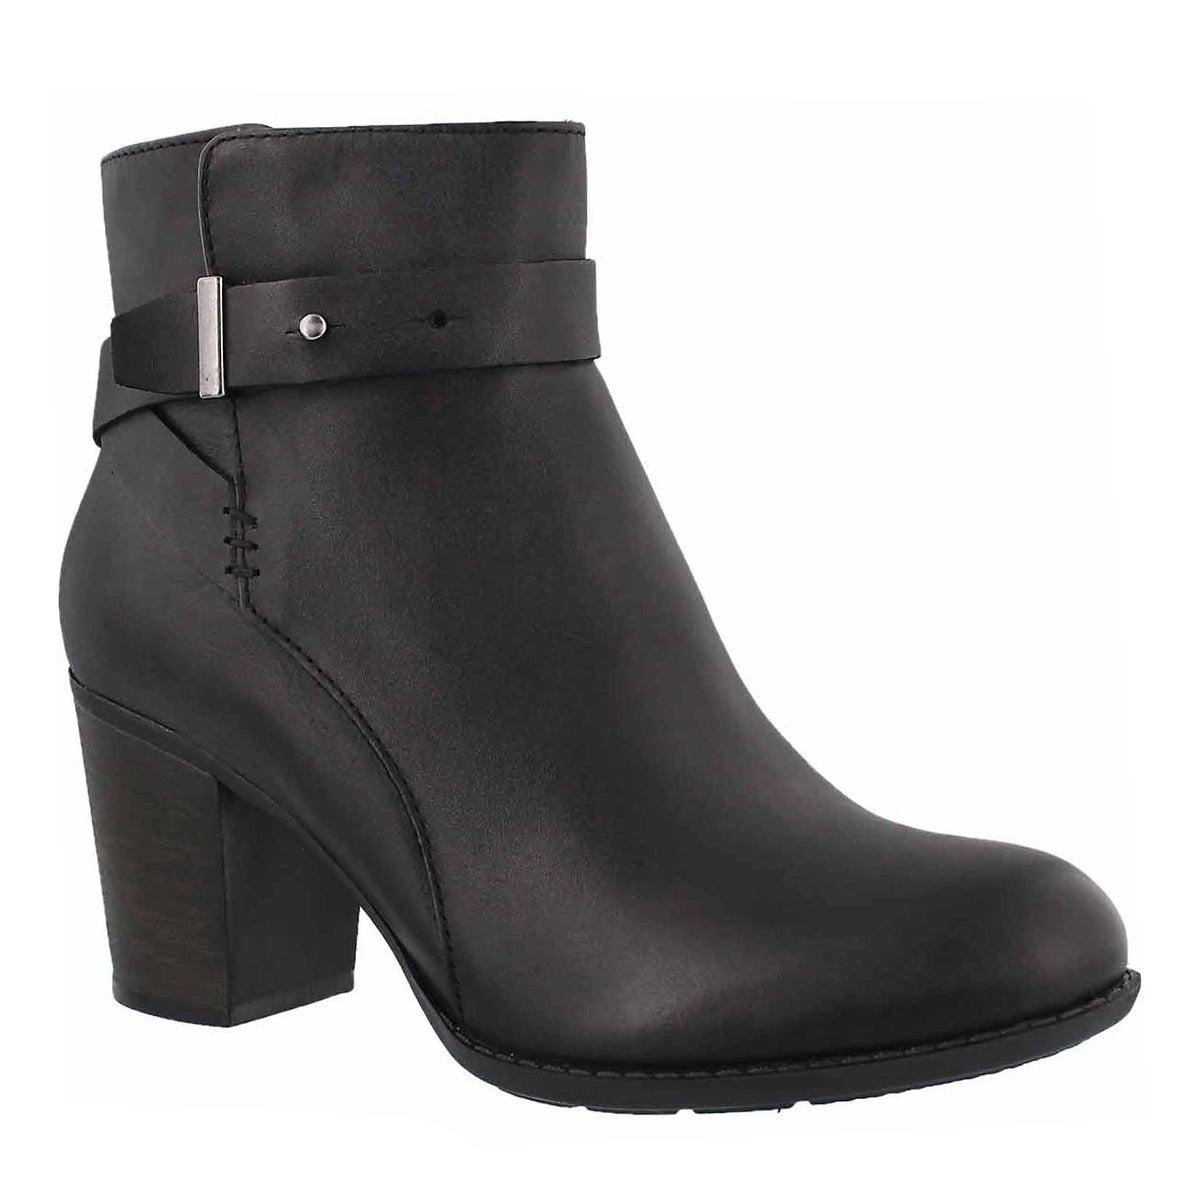 Women's ENFIELD SARI black dress booties